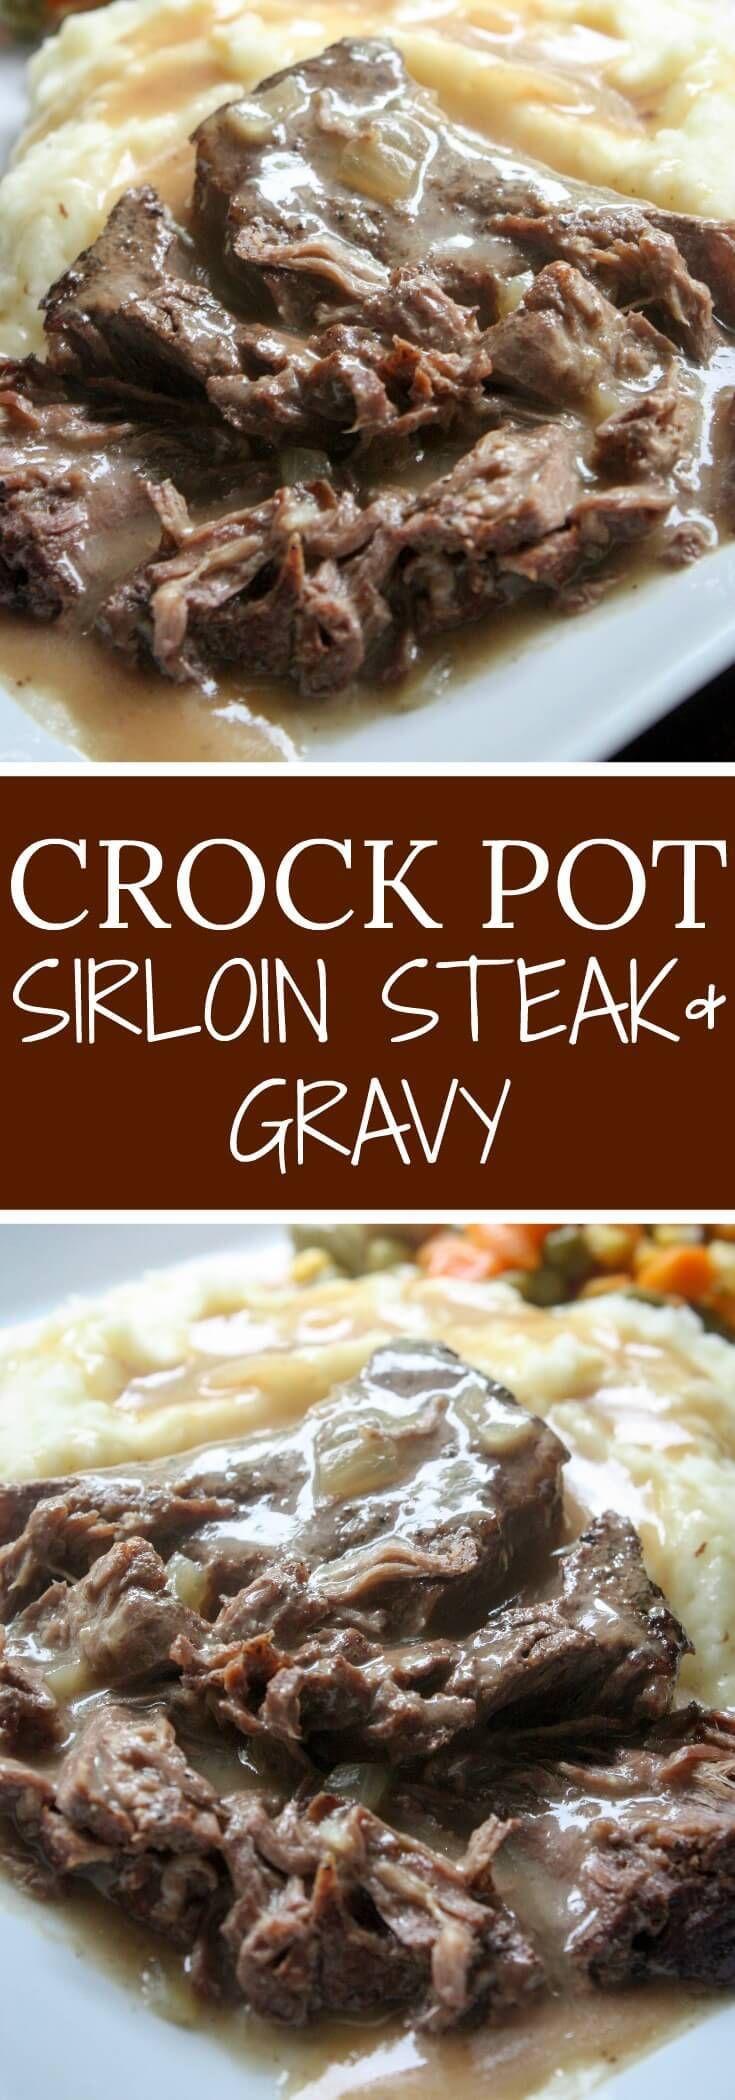 Slow Cooker Sirloin Steak And Gravy Recipe In 2019